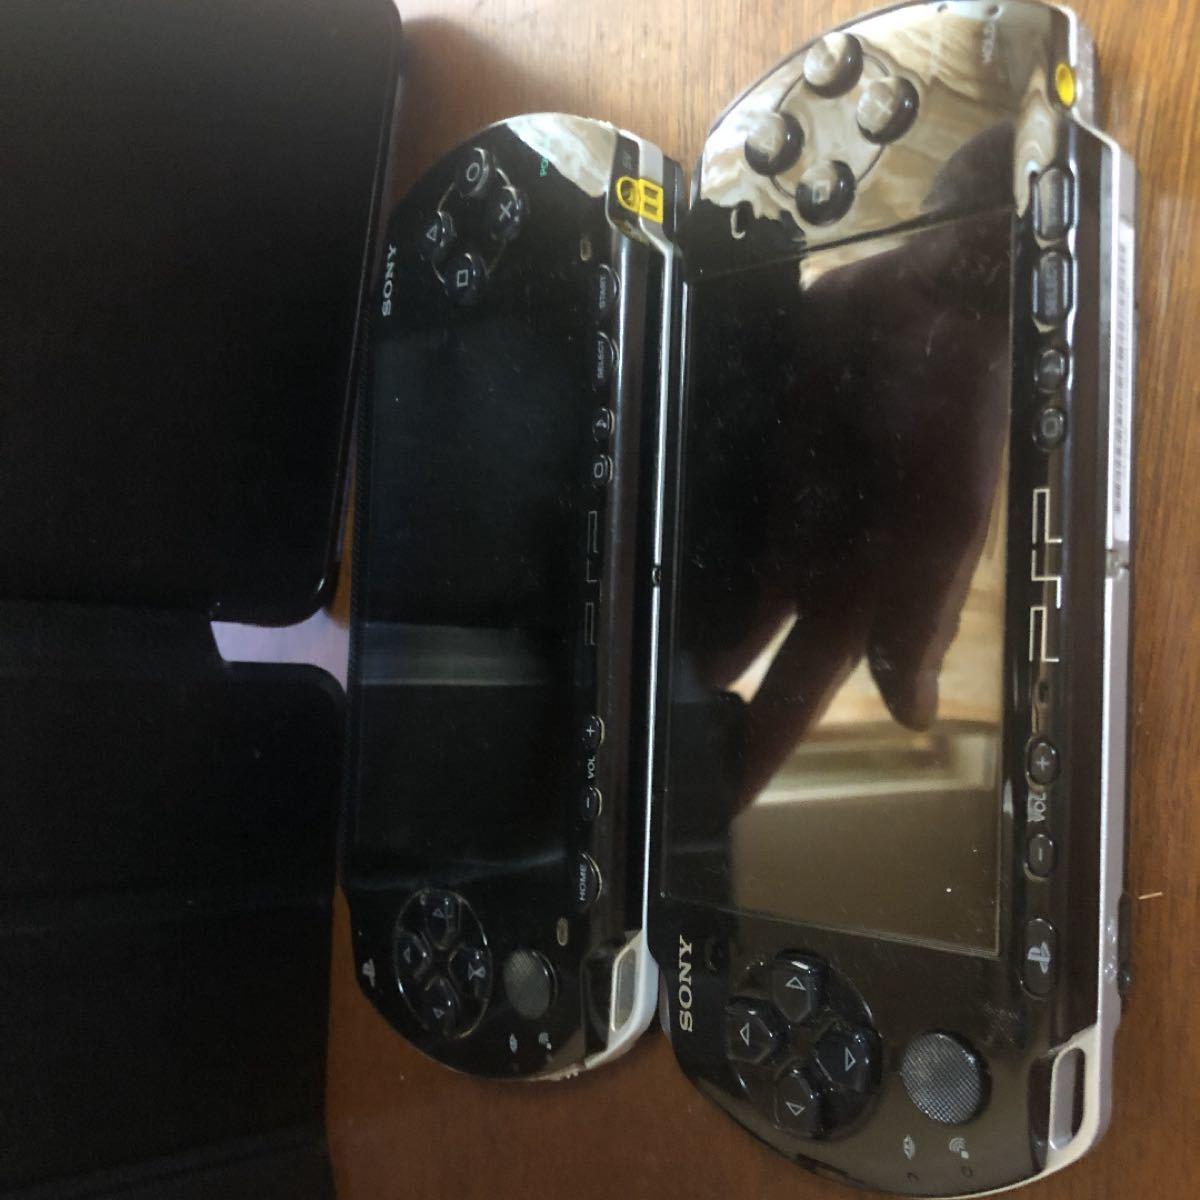 PSP3000番と1000番 ソフト大量セット PSP PSP本体 SONY